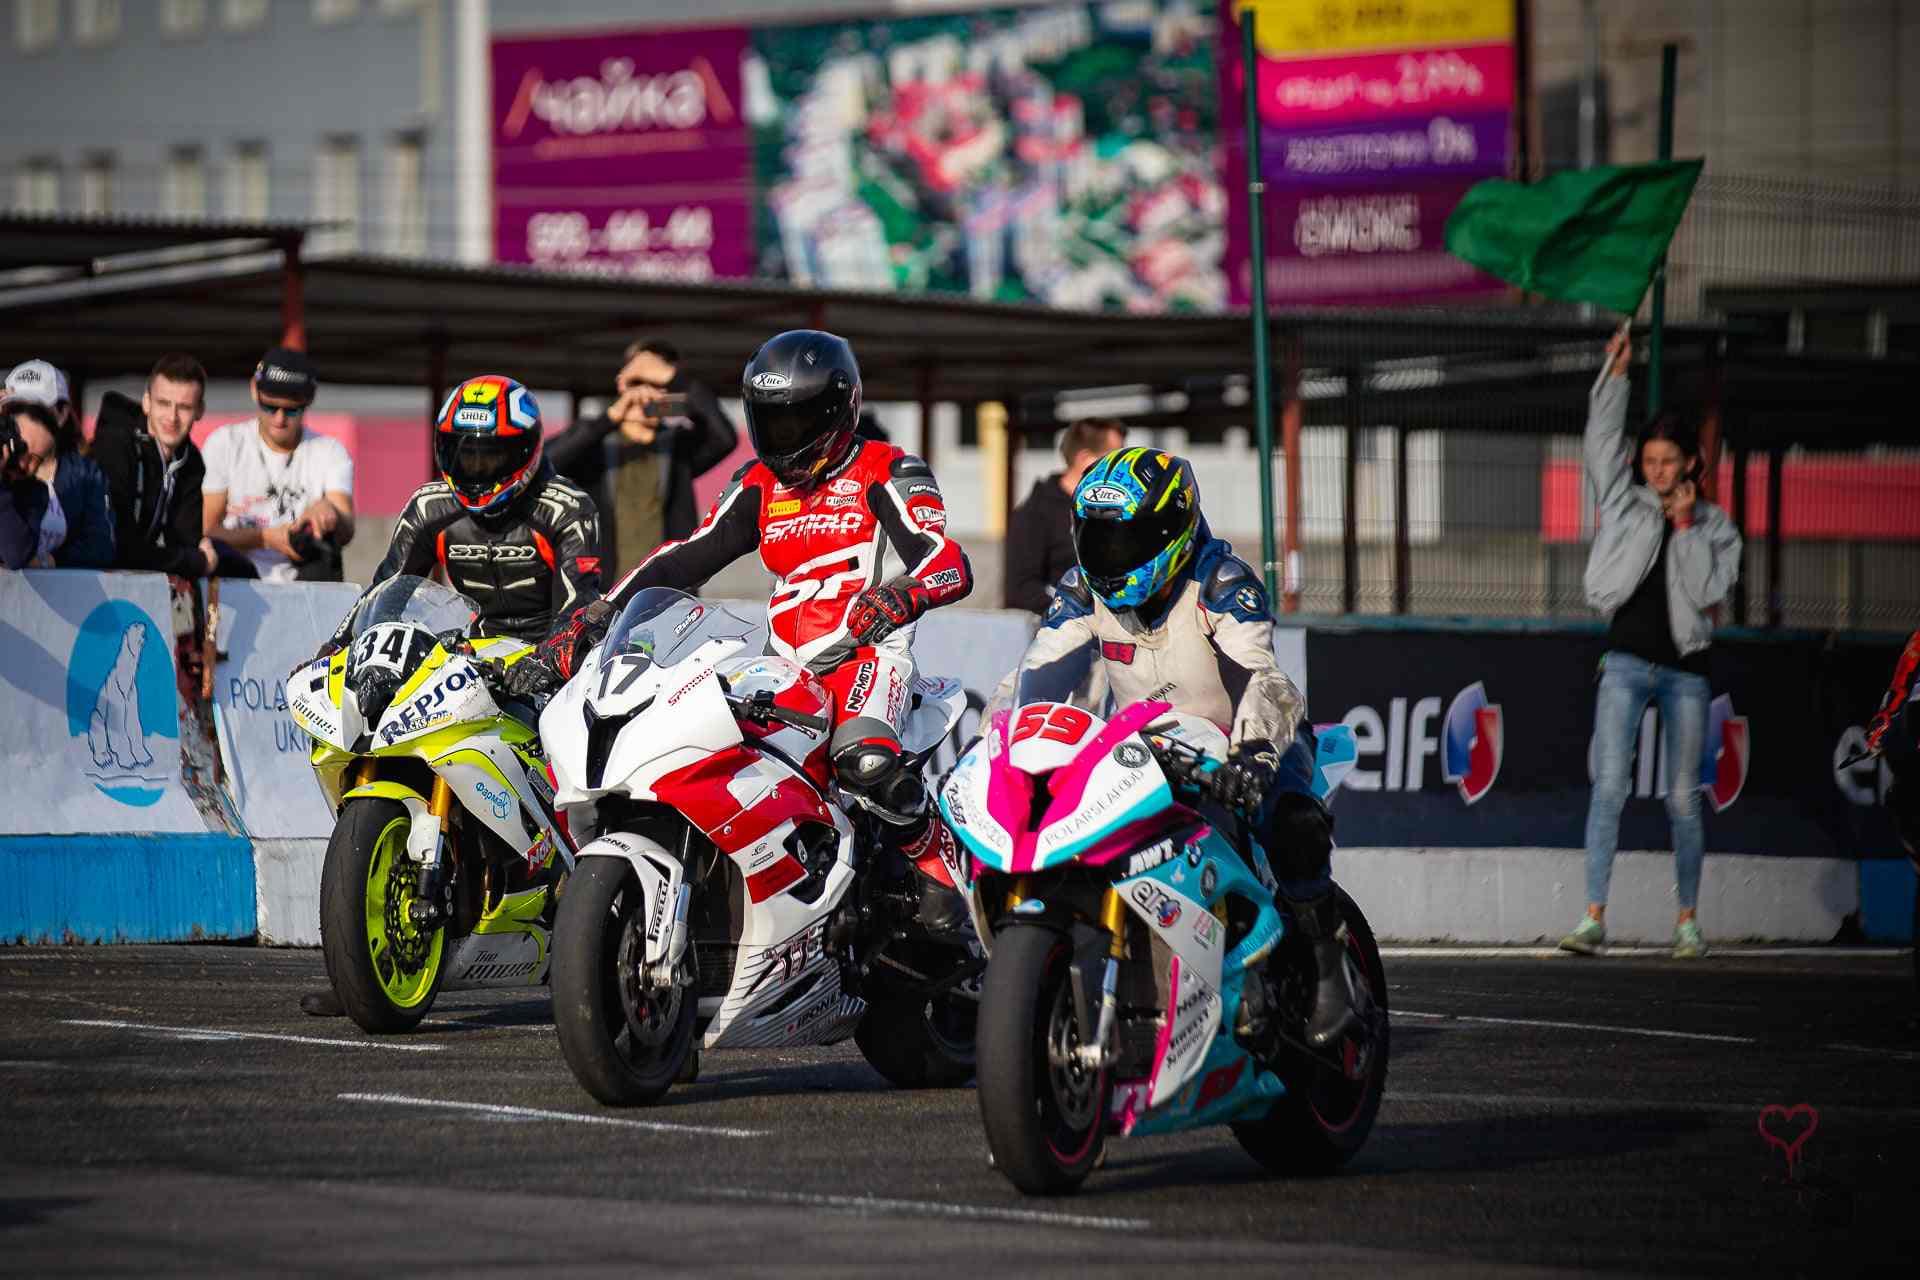 5-6_etap_MotoGPUkraine_164